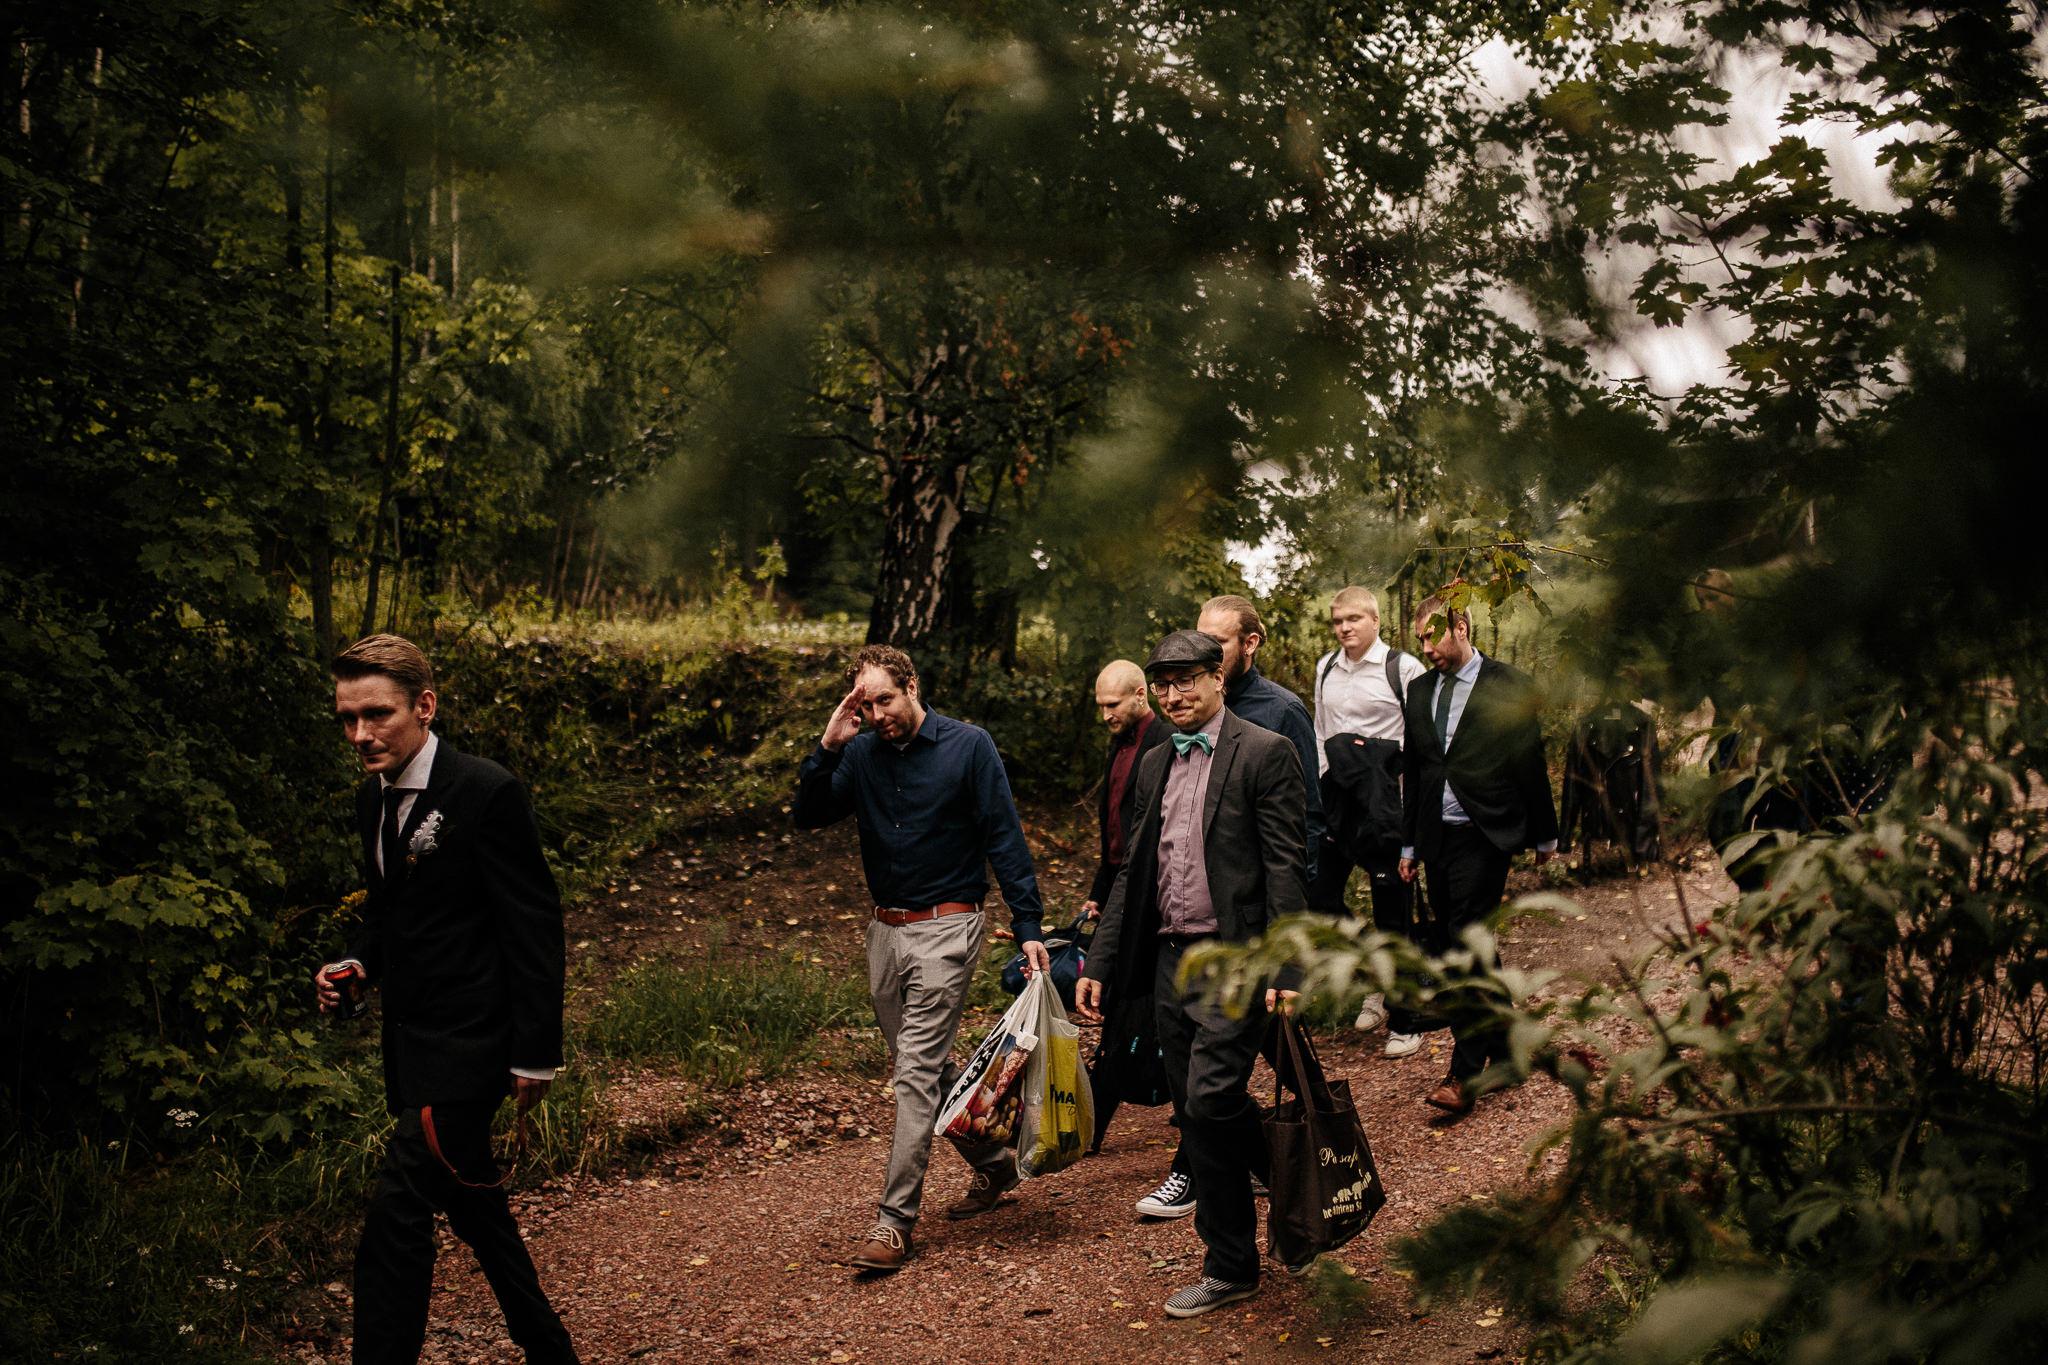 Ceren & Jani - Finland Wedding Photographer - Weddings by Qay - Wedding Photographer (77 of 166).jpg